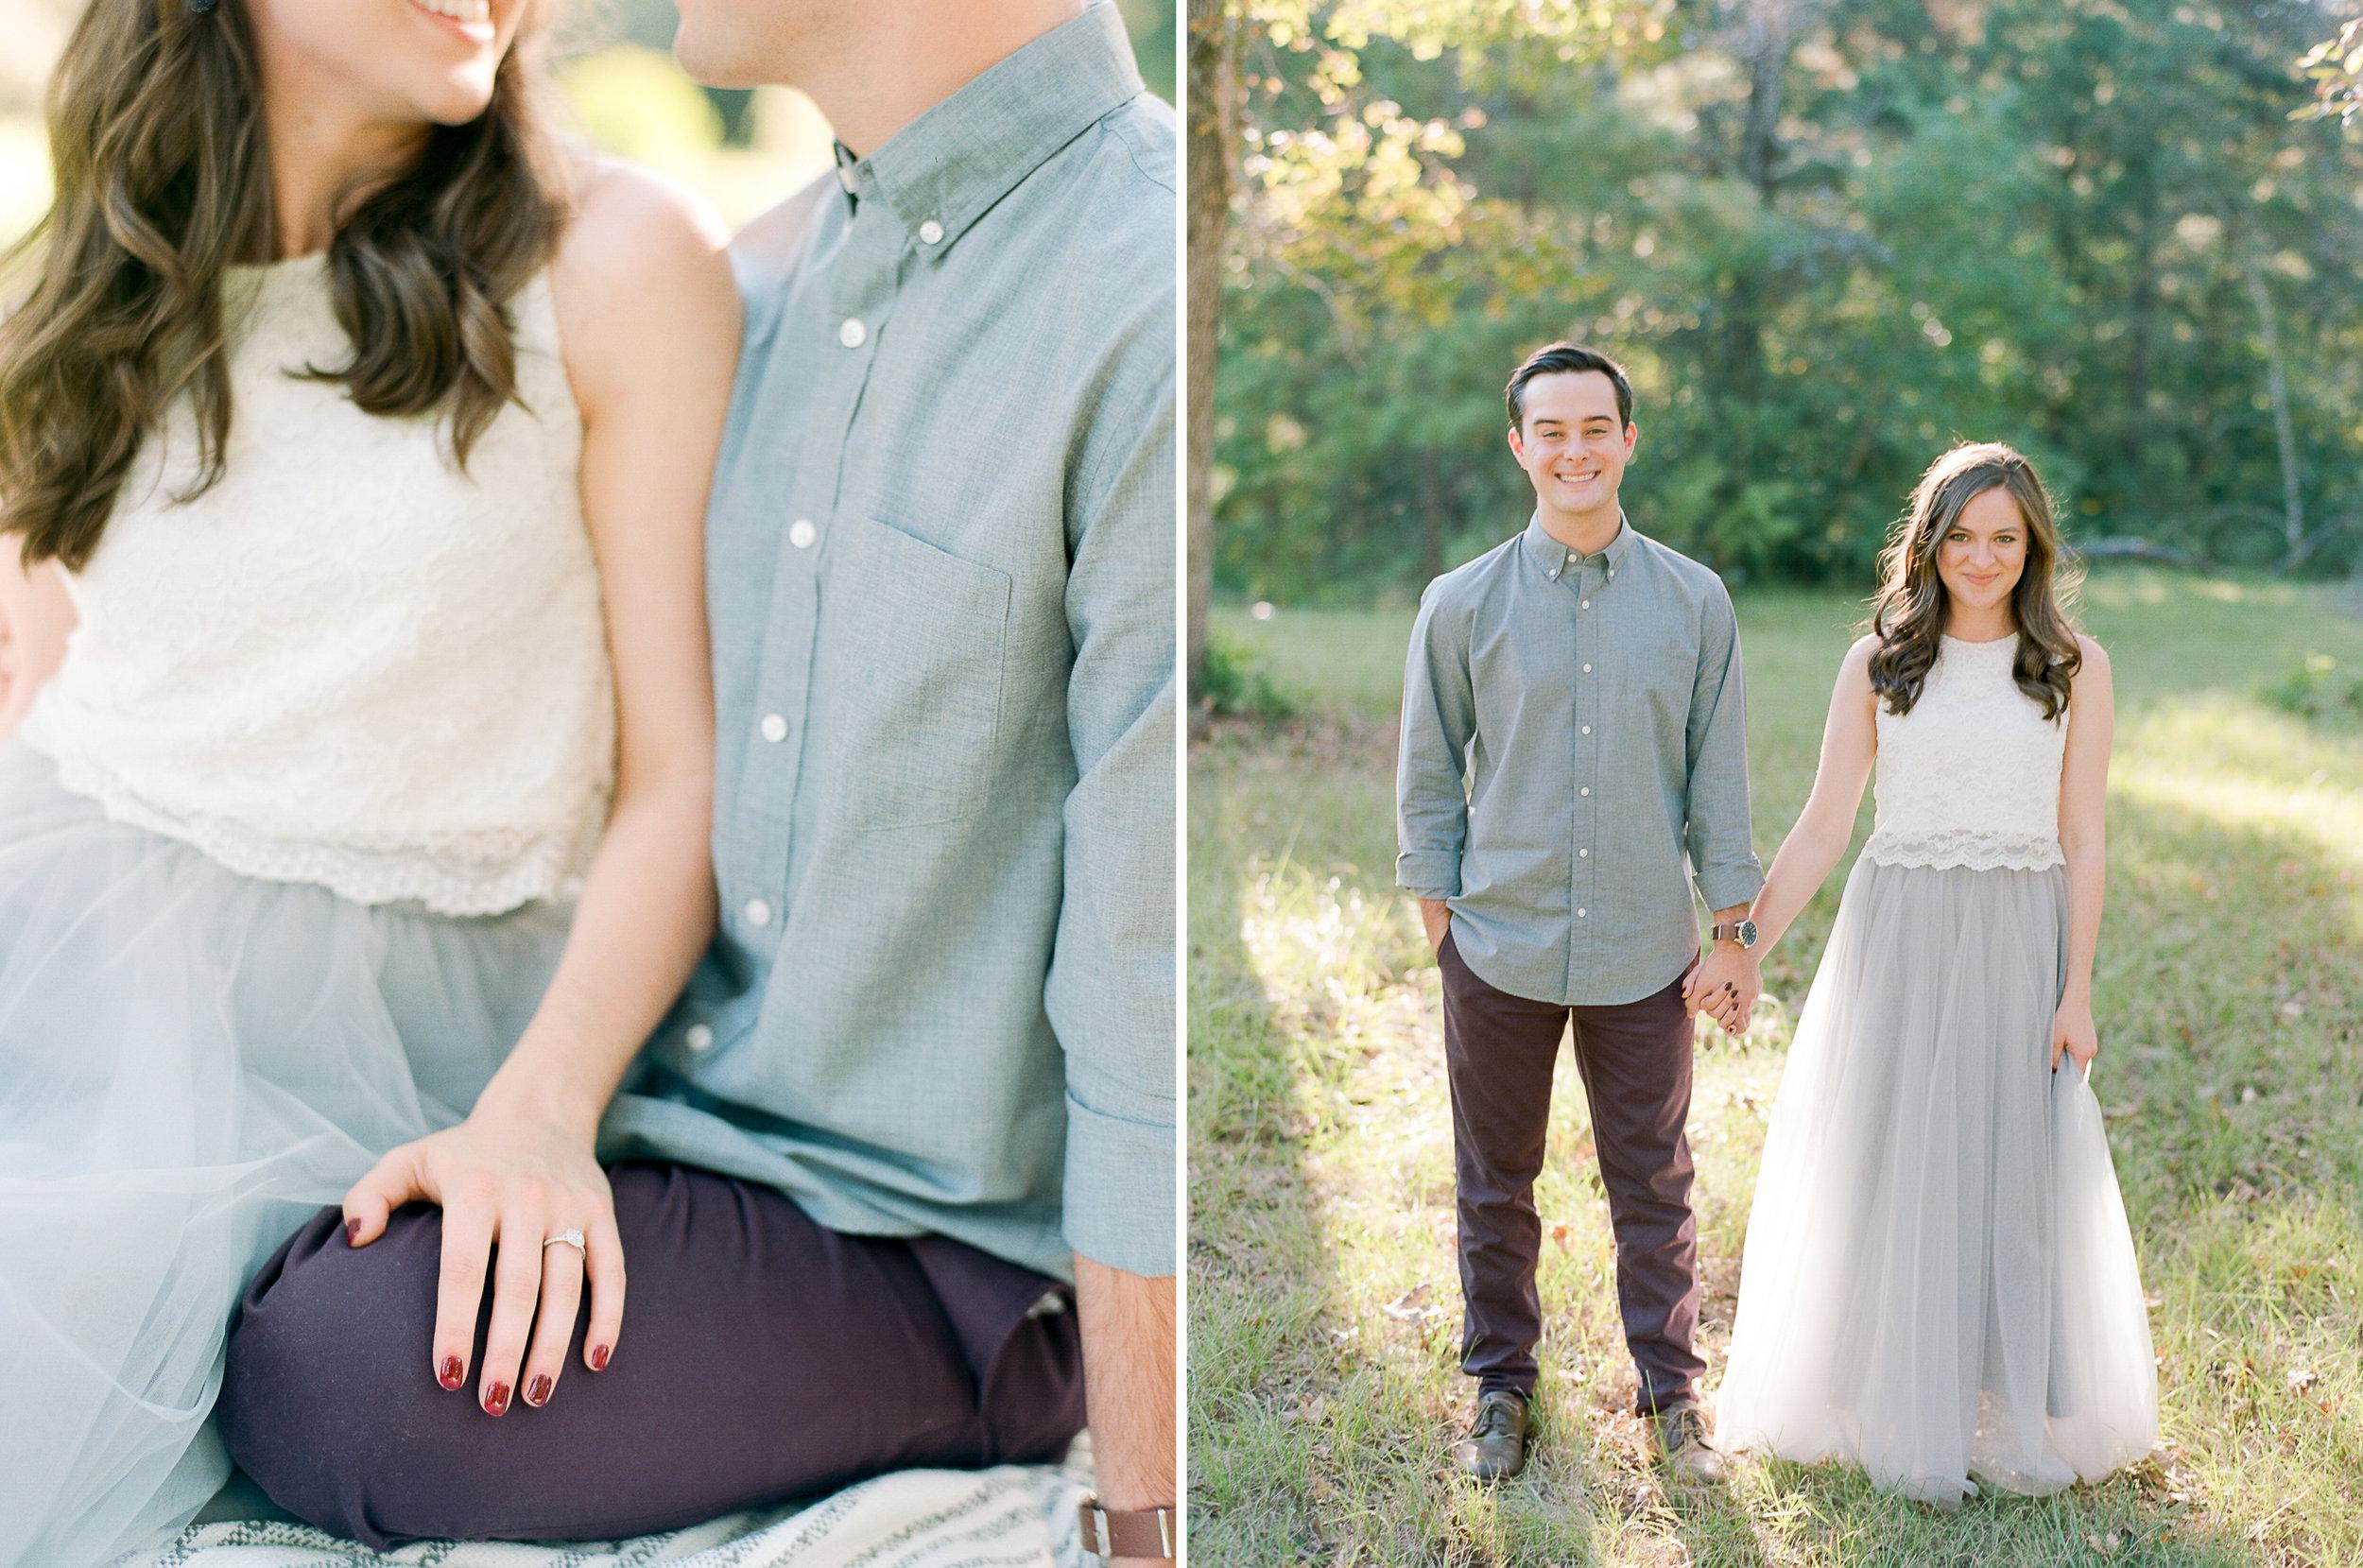 houston-wedding-photographer-college-station-austin-the-woodlands-film-photography-style-me-pretty-engagements-dana-fernandez-photography-107.jpg